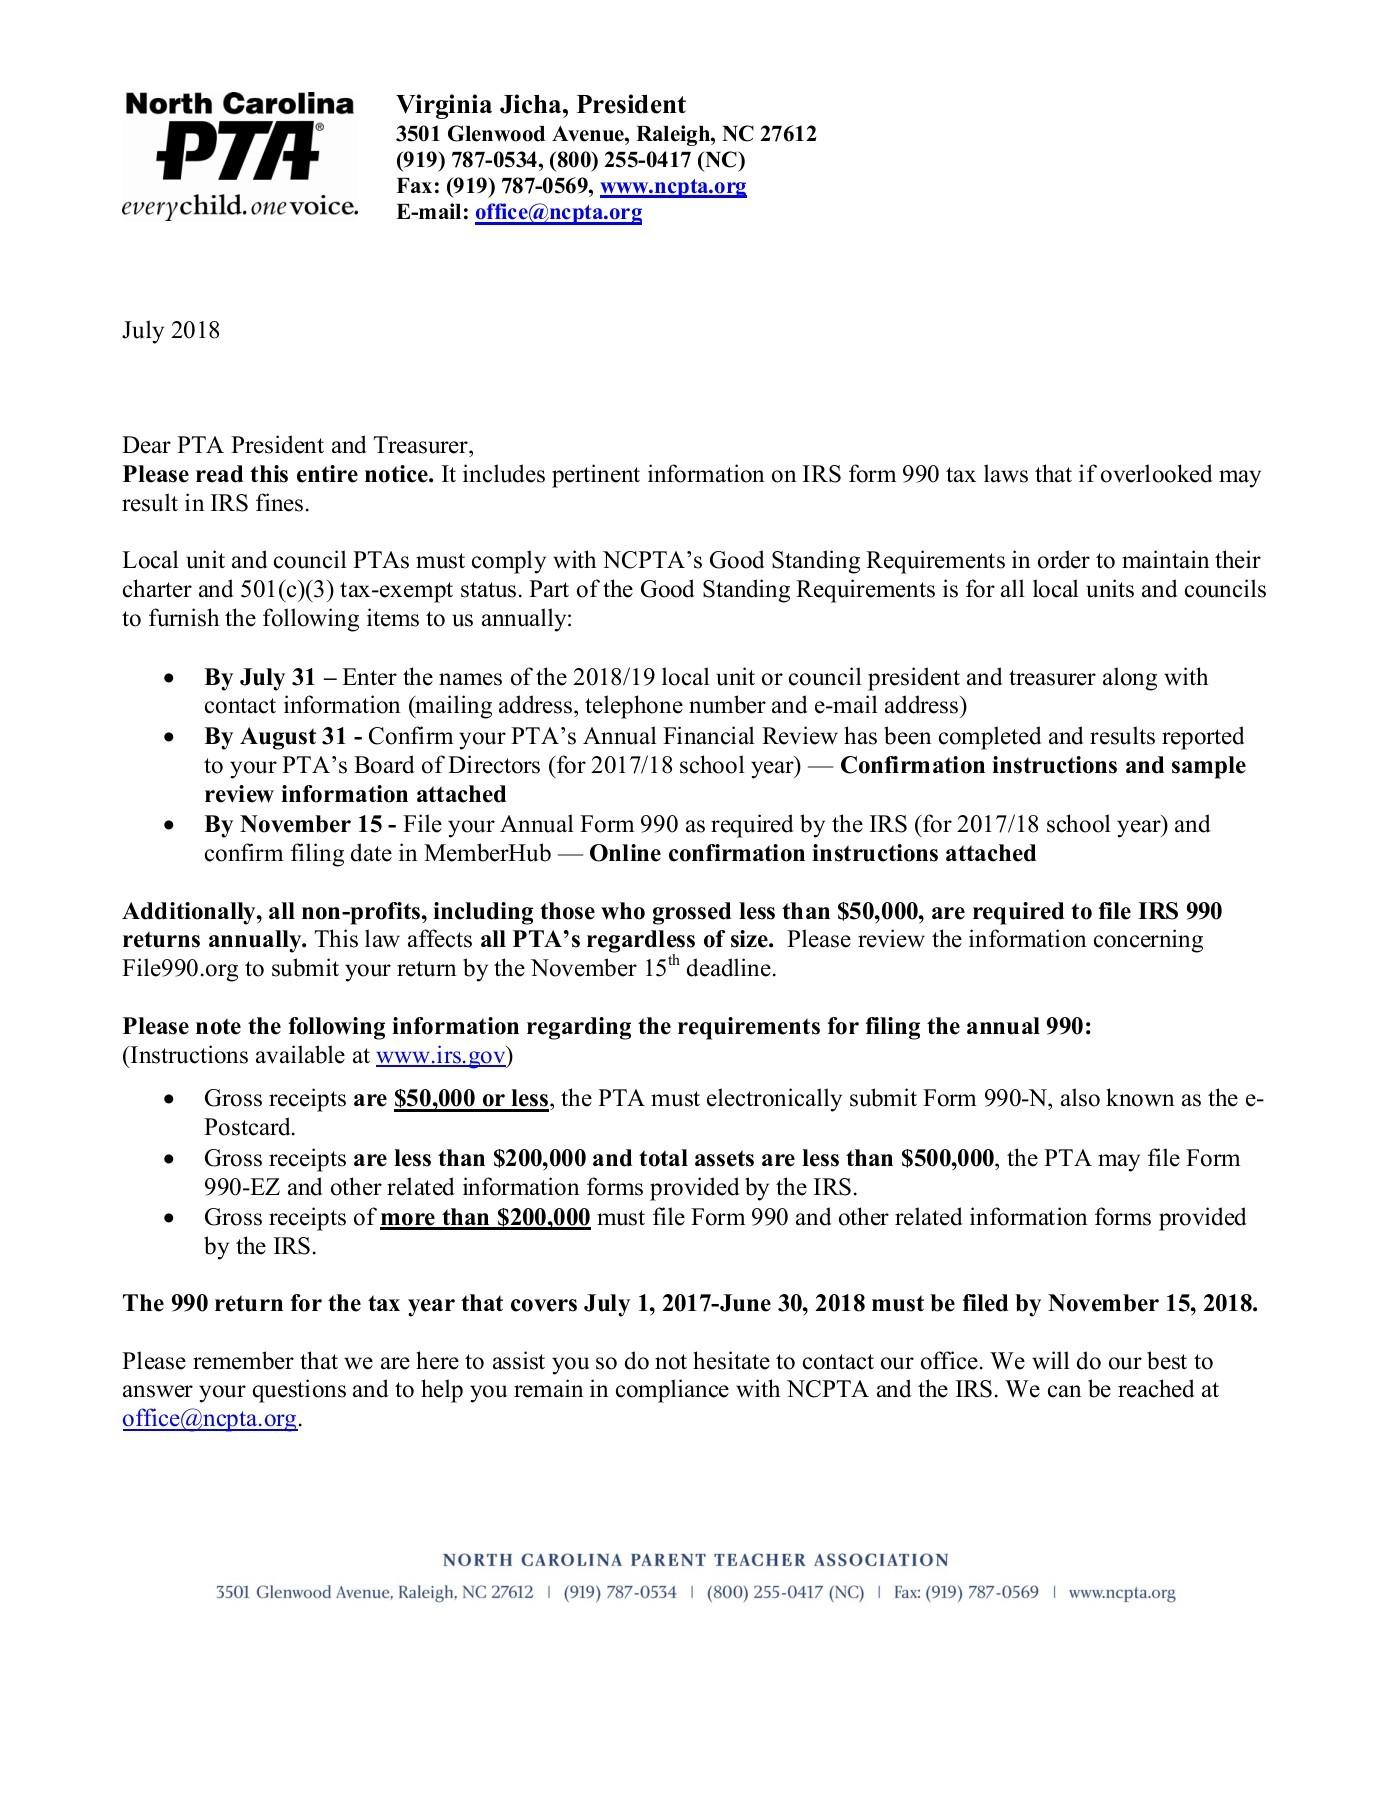 Form 990 Filing Deadline 2017